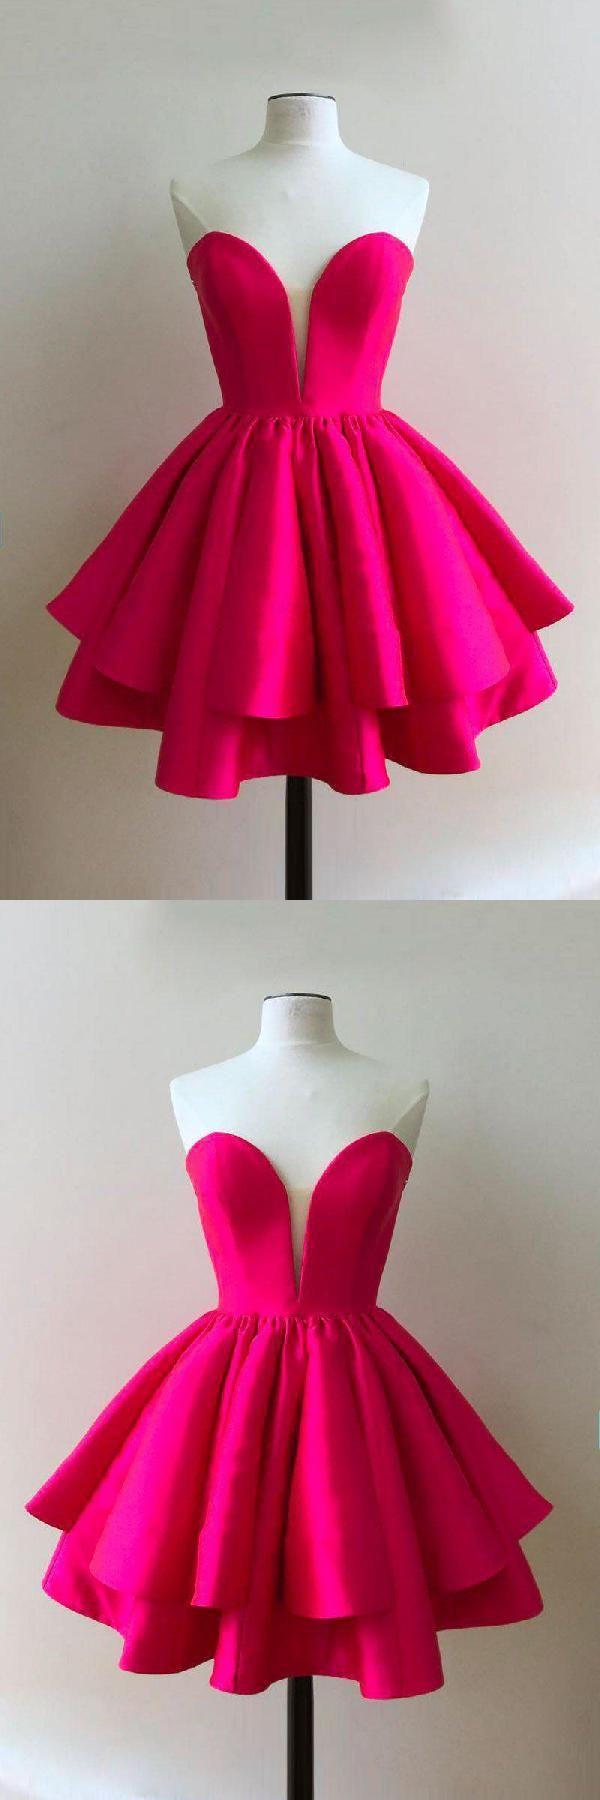 Prom dresses red cute prom dresses simple prom dresses